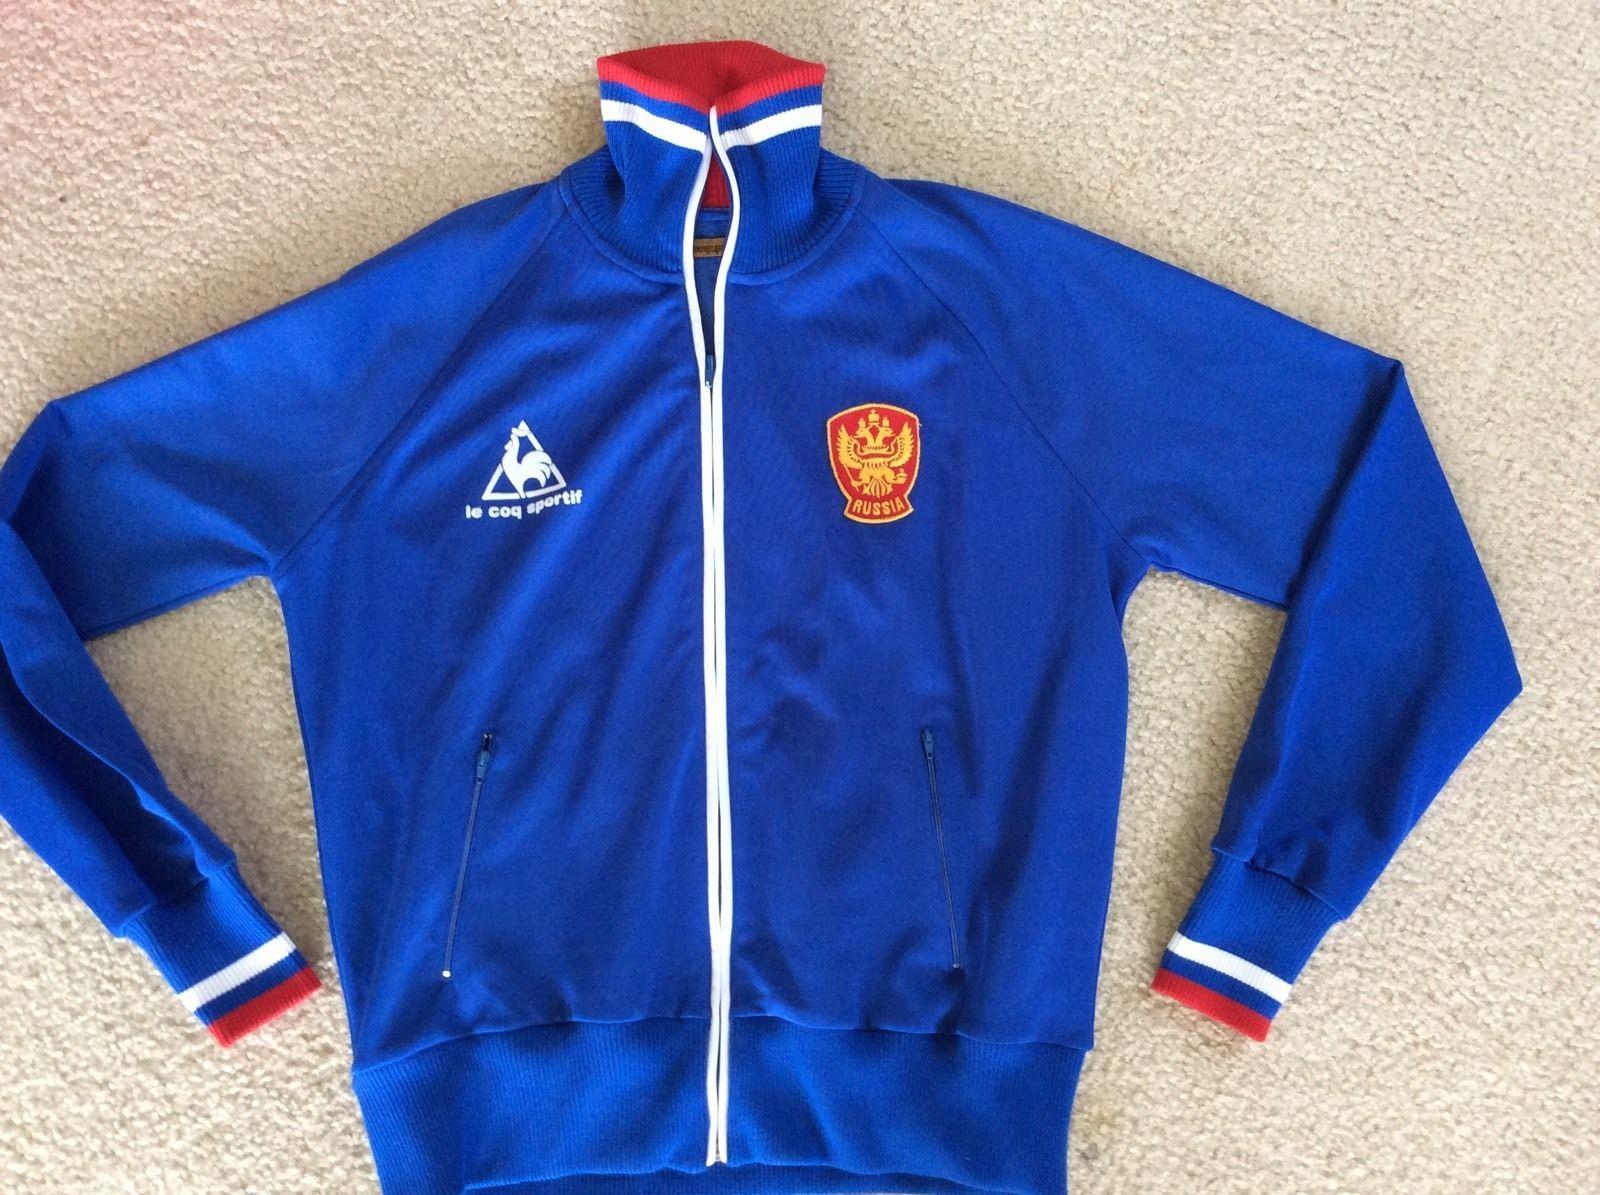 vintage le coq sportif russia national team soccer warm up jacket xl. Black Bedroom Furniture Sets. Home Design Ideas